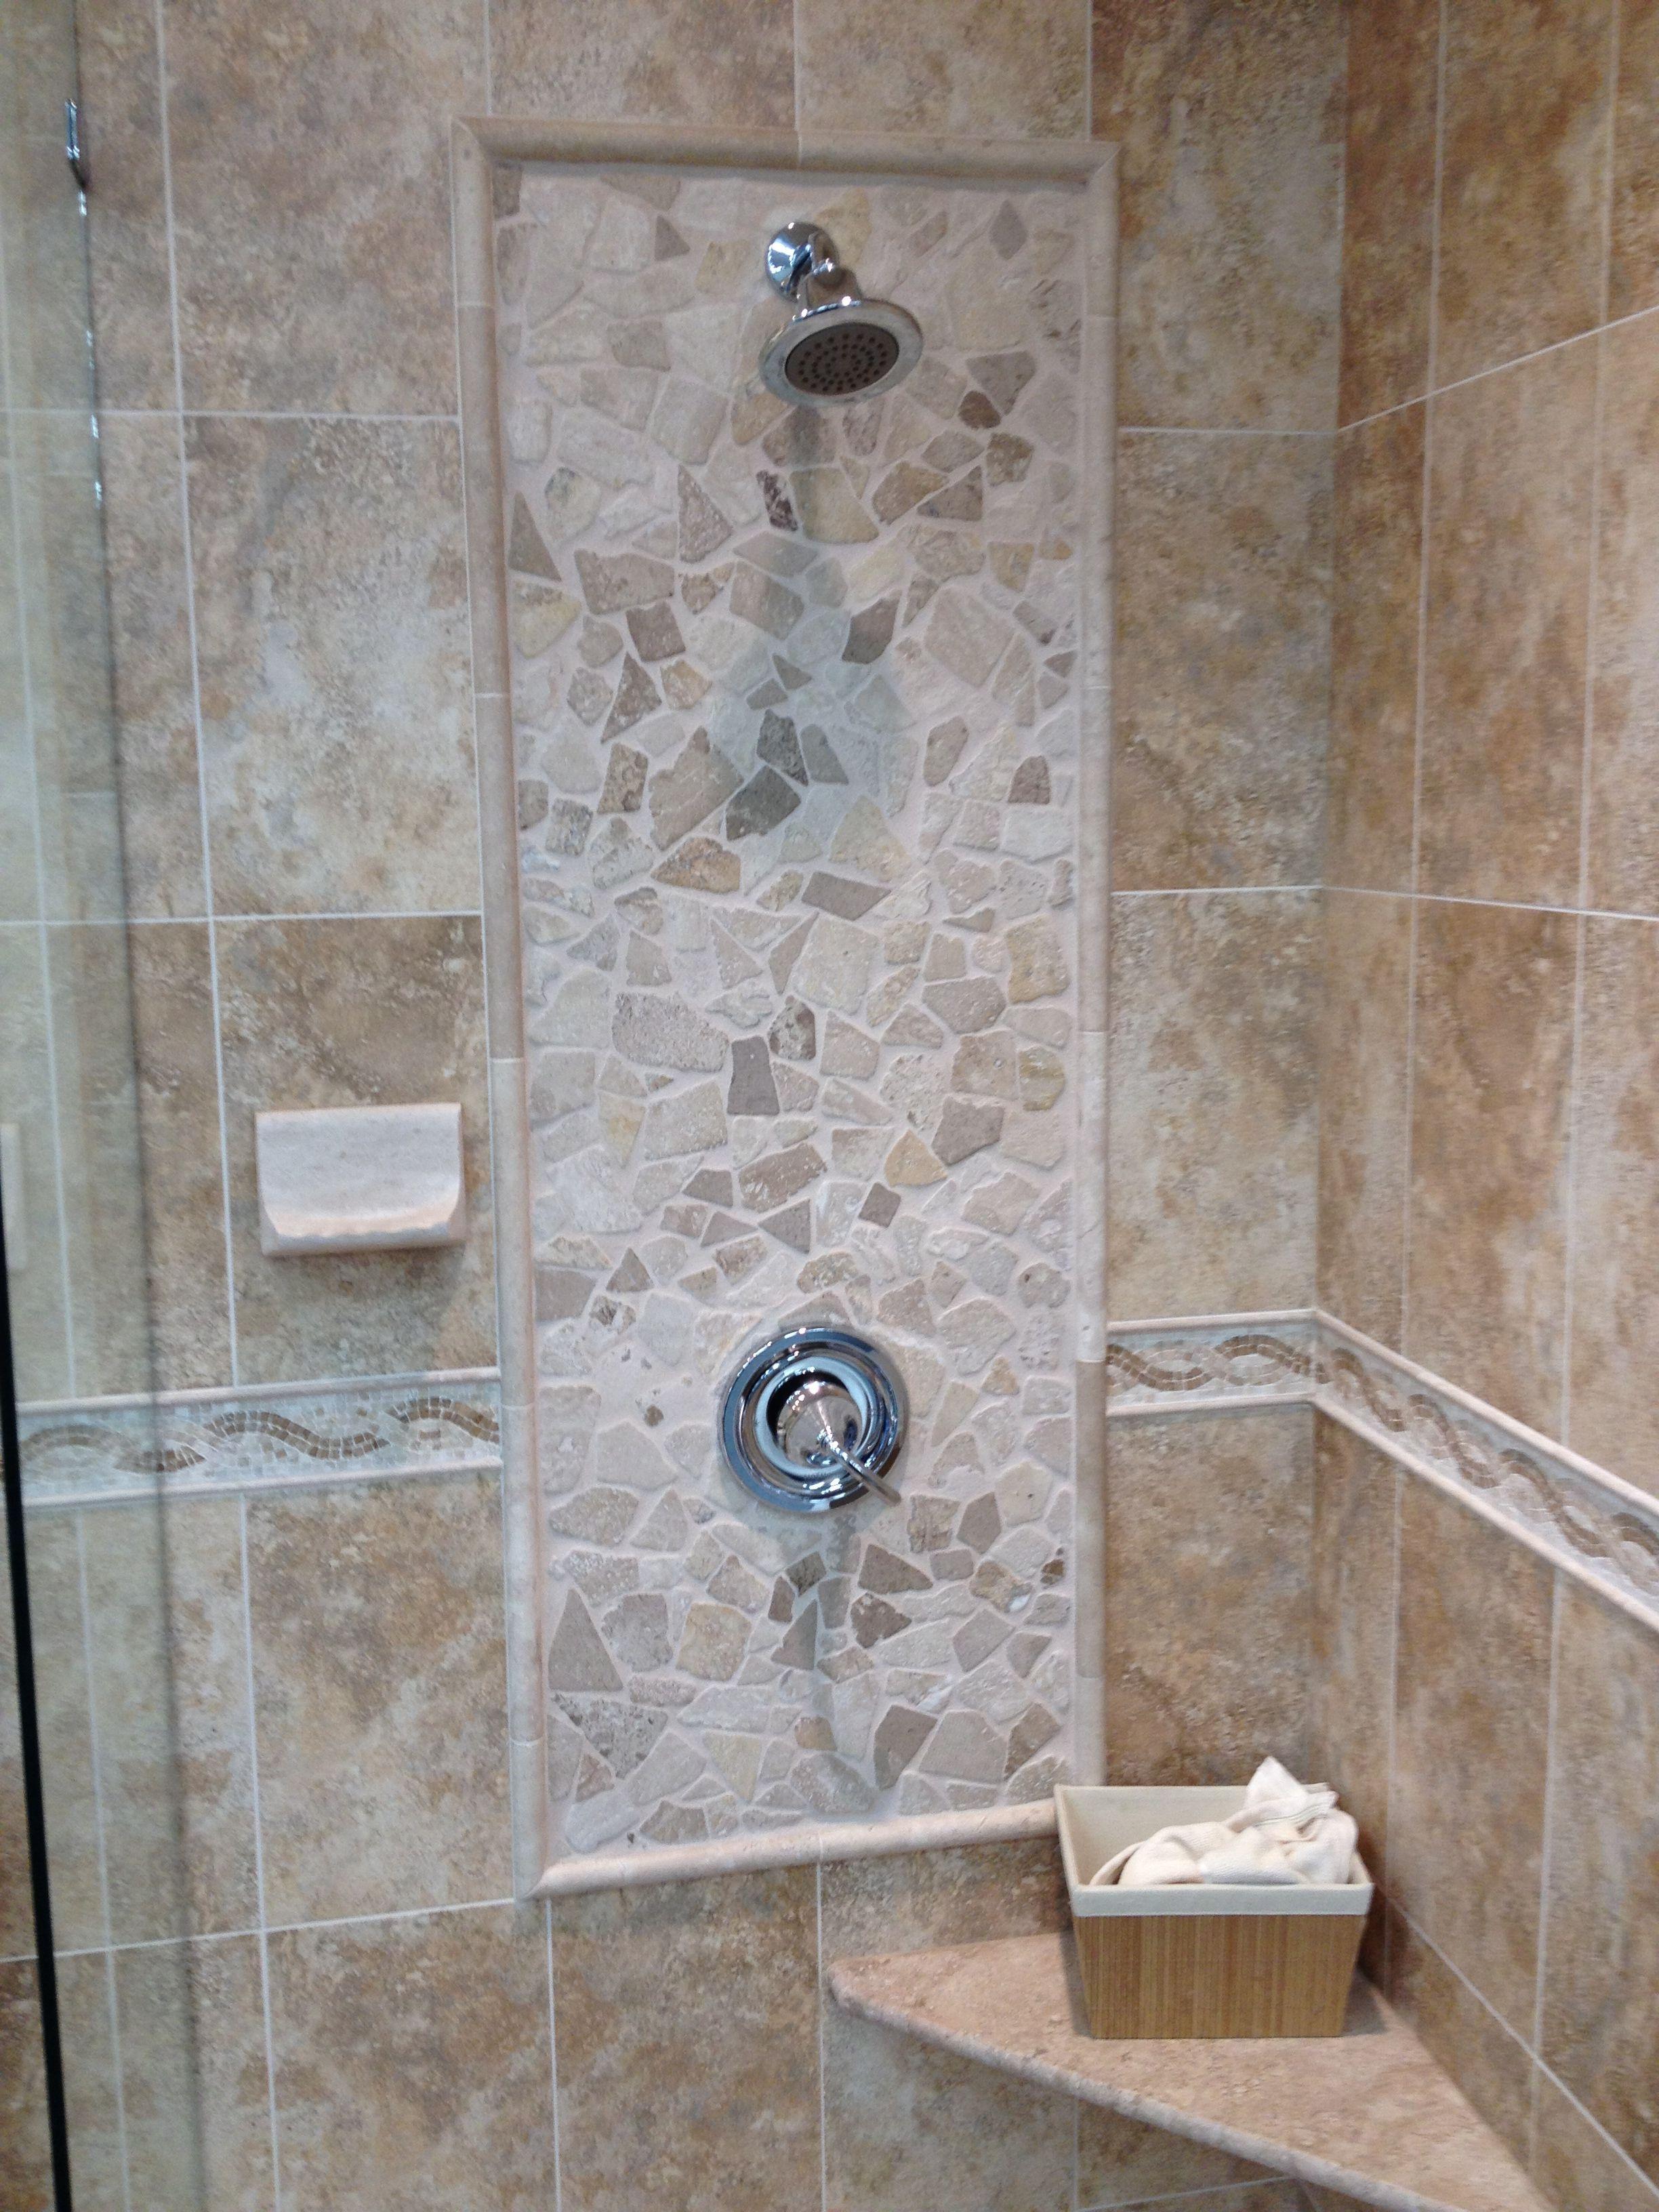 Tile idea around shower head and faucet   i decorate - bathroom ...